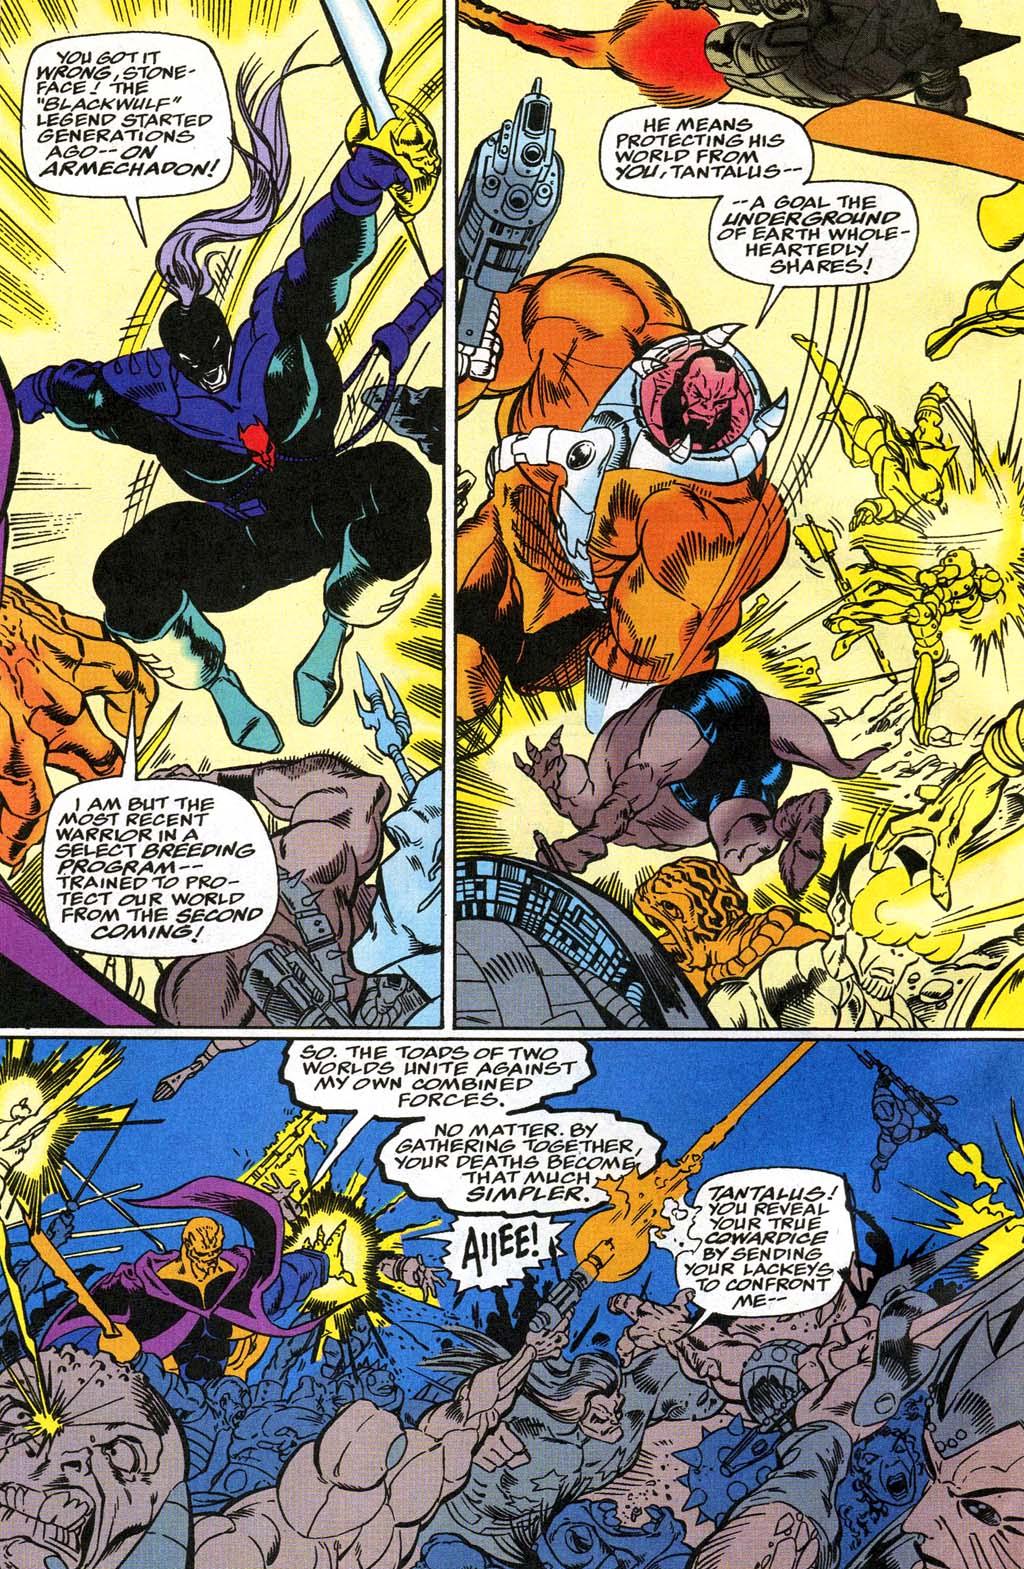 Read online Blackwulf comic -  Issue #8 - 14